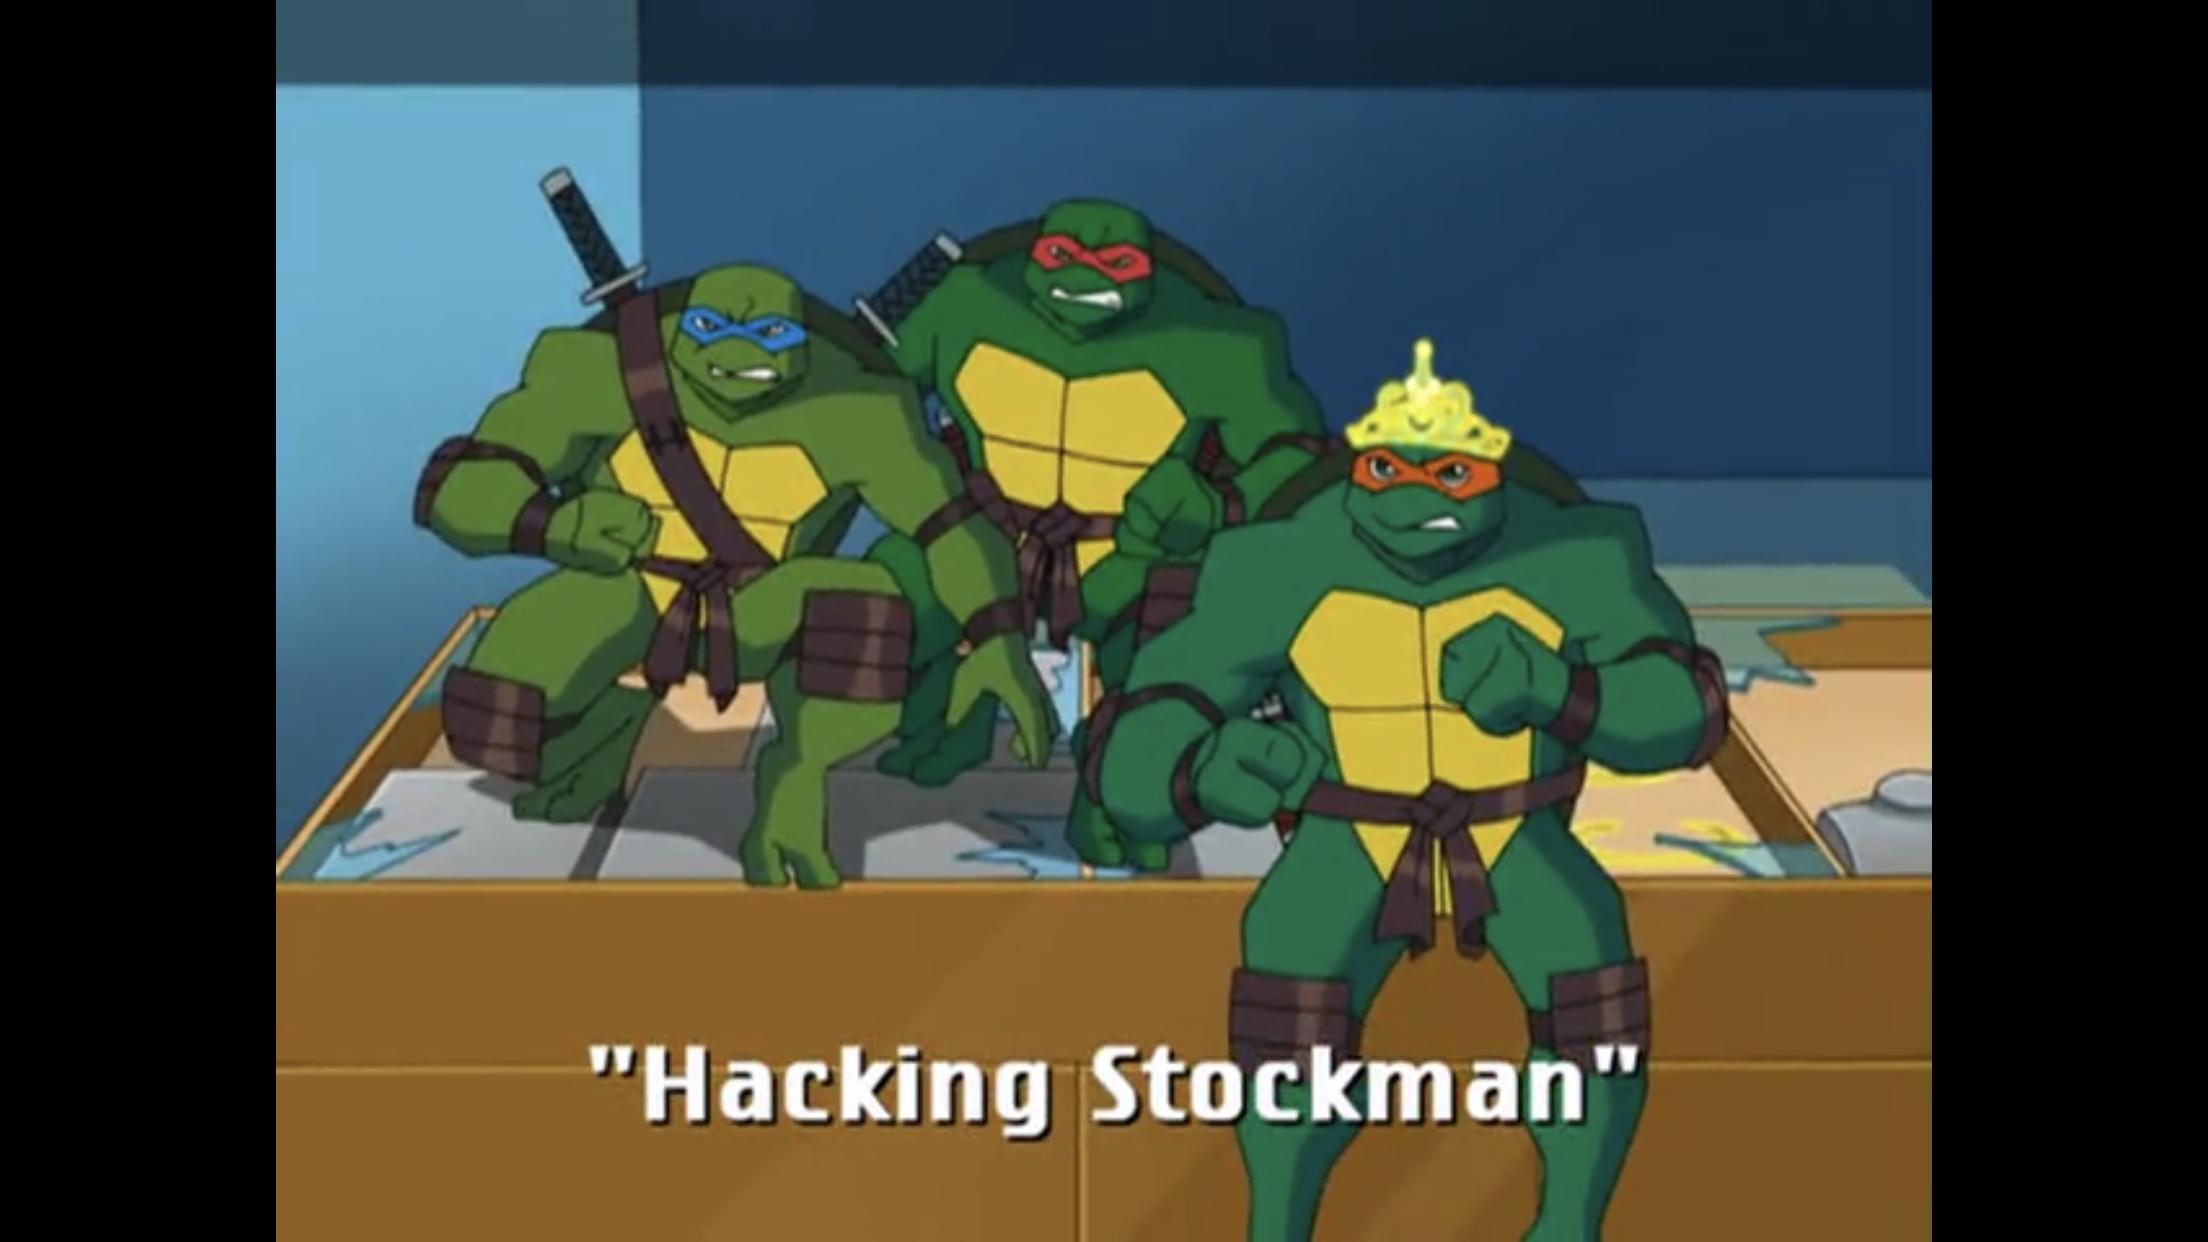 Hacking Stockman